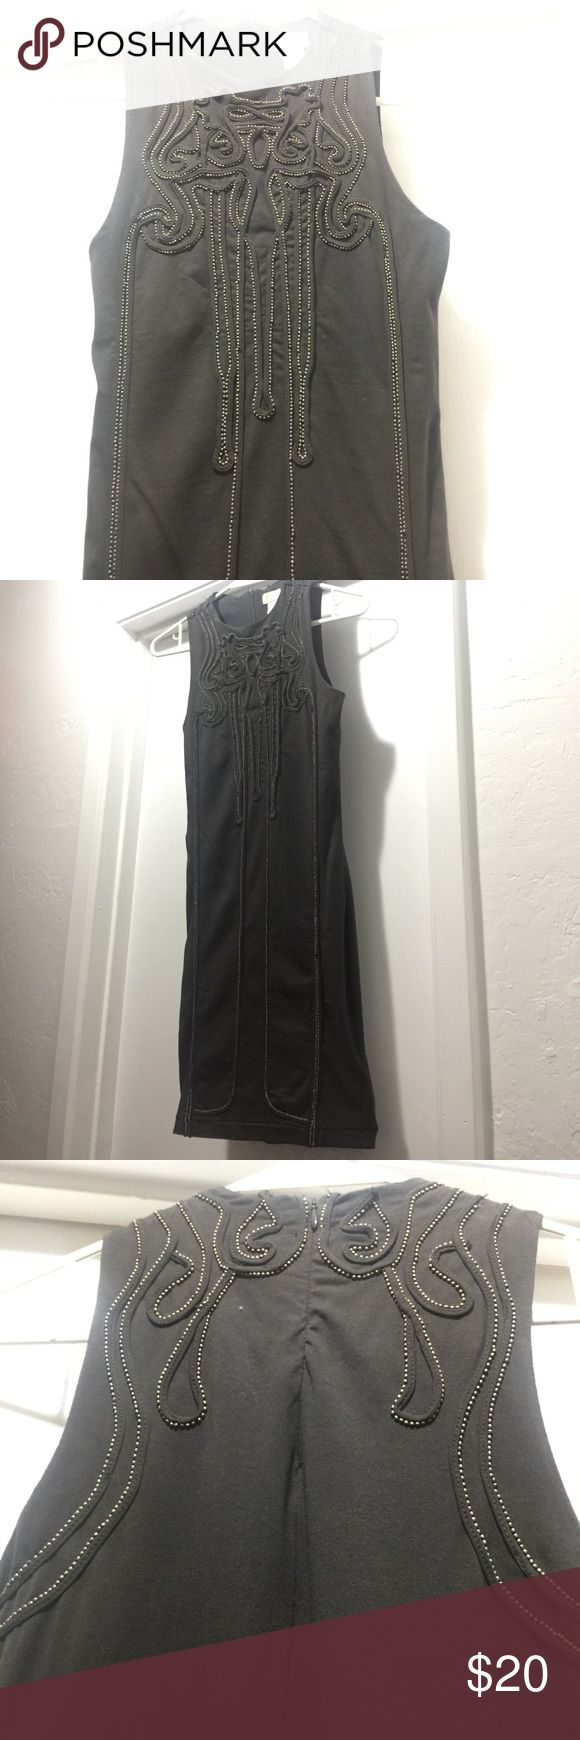 Selling this H&M grey beaded bon con dress on Poshmark! My username is: bwitni. #shopmycloset #poshmark #fashion #shopping #style #forsale #H&M #Dresses & Skirts